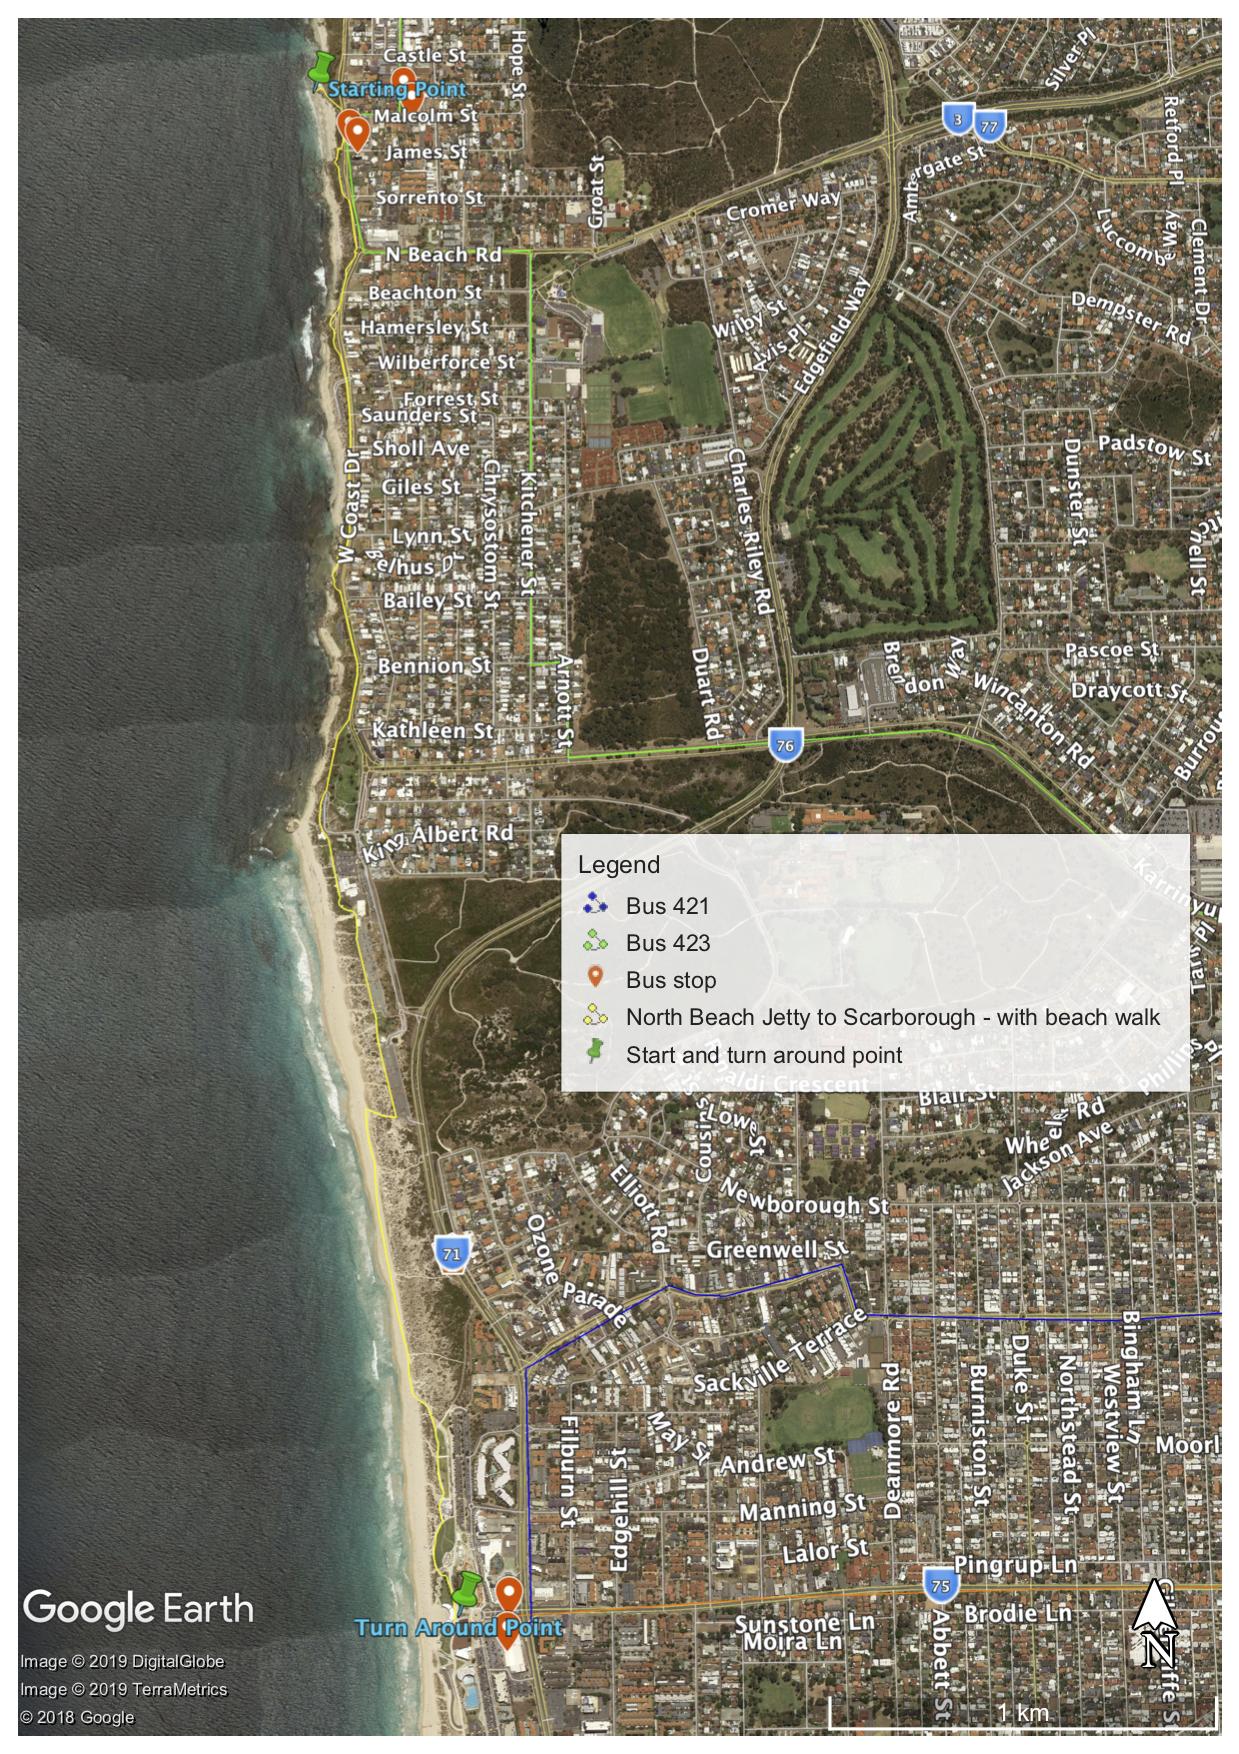 North Beach Jetty to Scarborough Beach_Fig 1.jpg